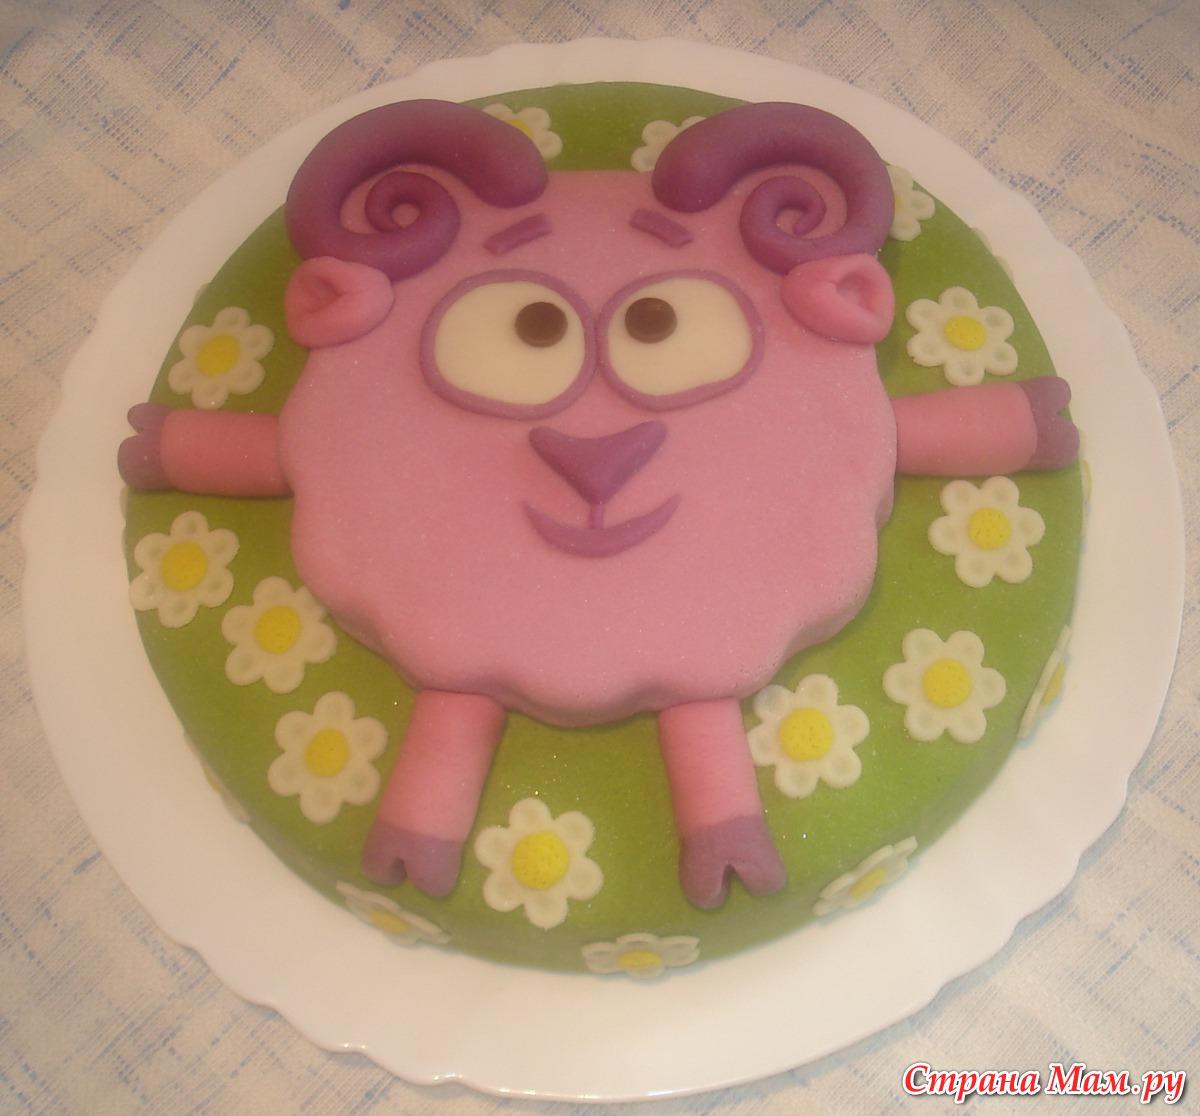 Торт смешарики нюша своими руками